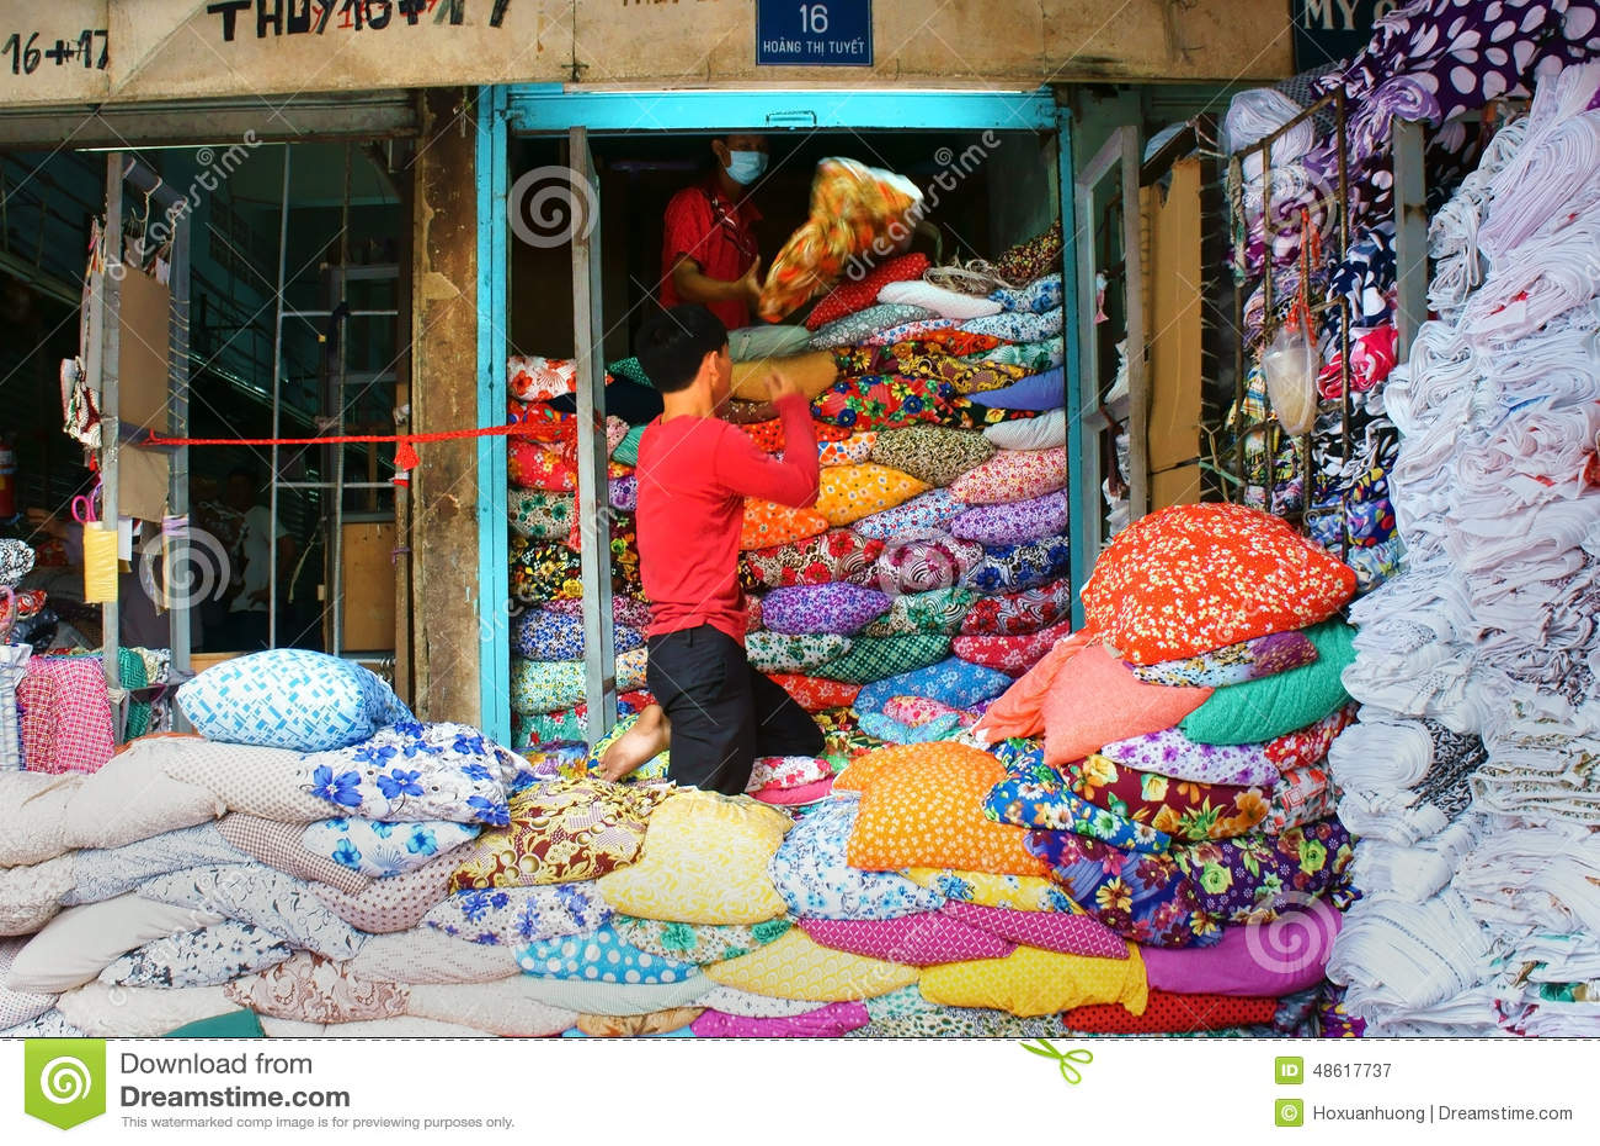 Vietnam clothing stores online